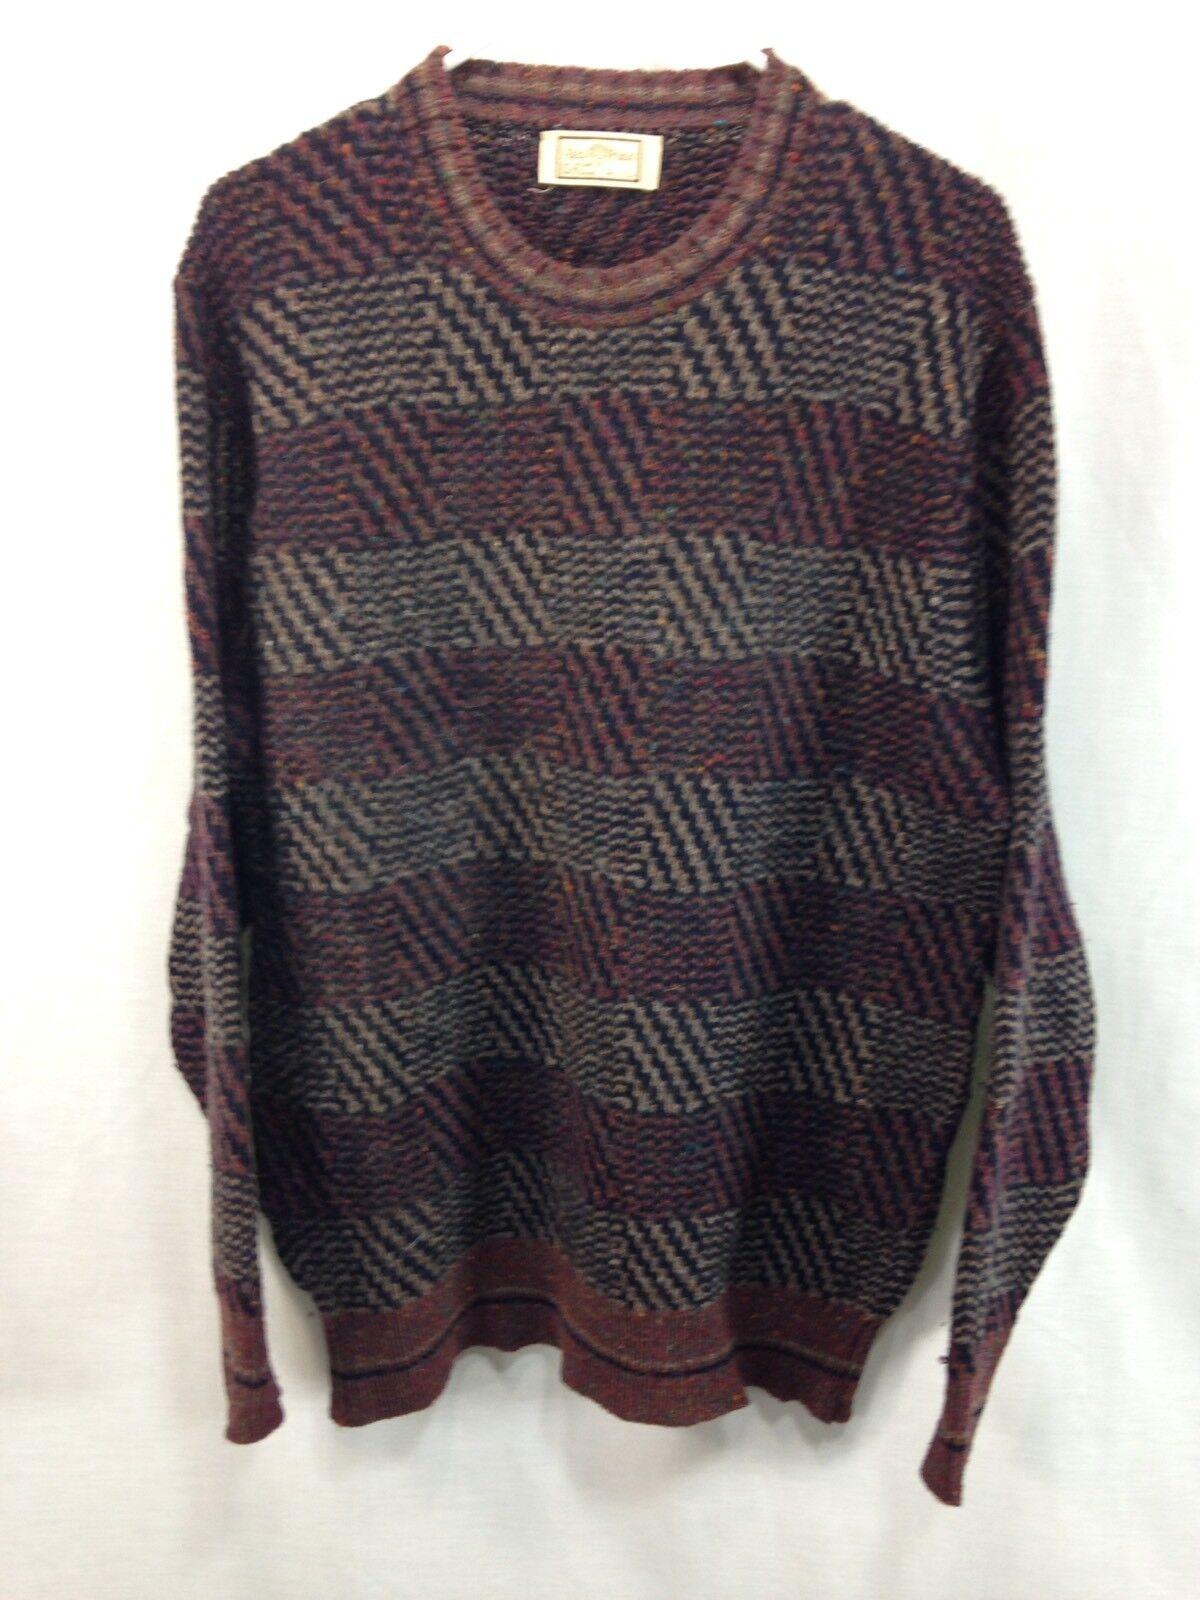 VTG Alan Paine Knit Sweater  Herren 44 Large 100% Shetland Wool Made in Engand